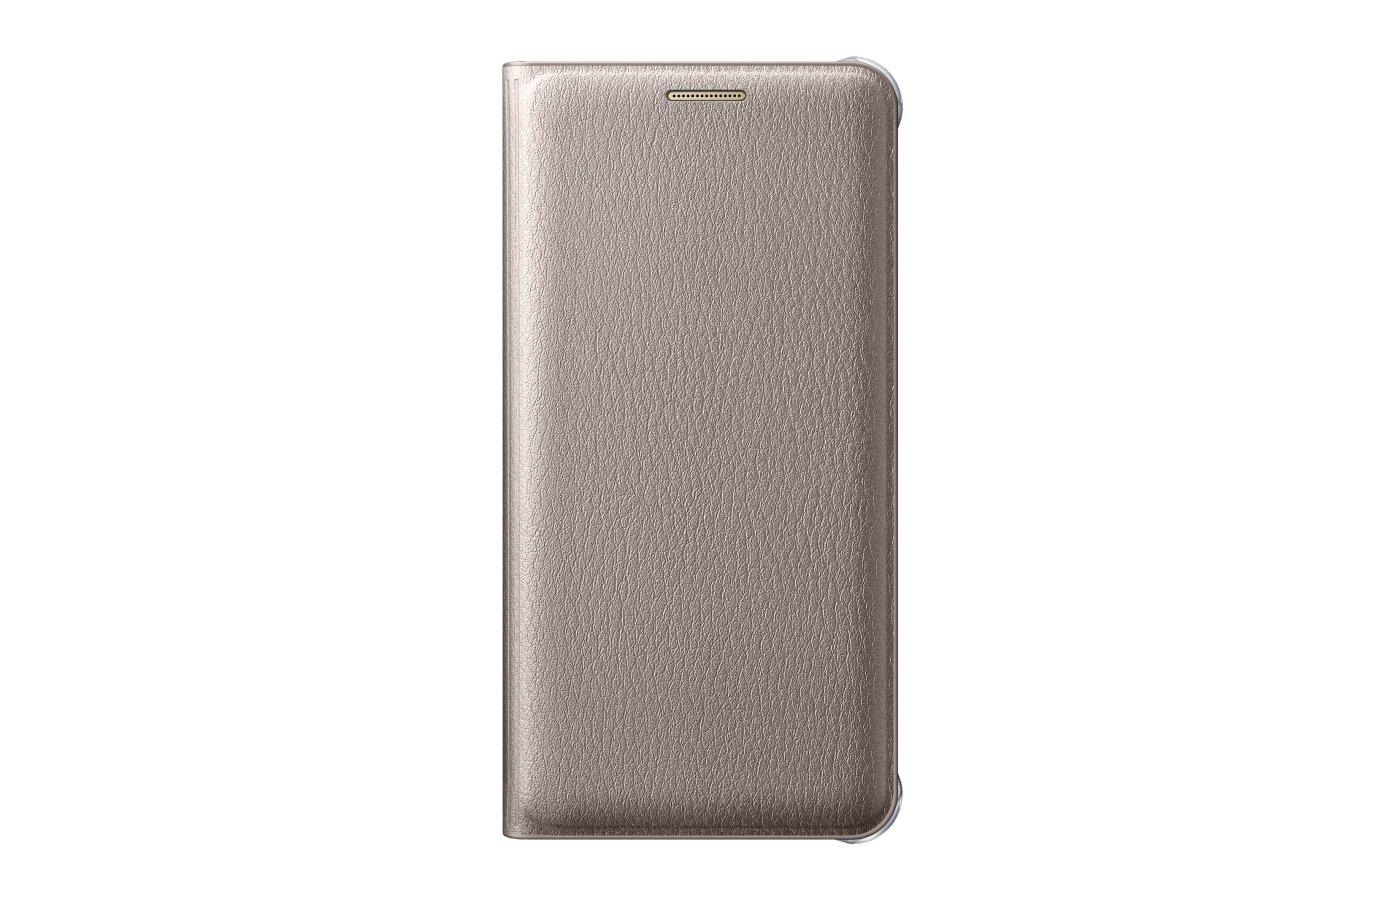 Чехол Samsung Flip Wallet для Galaxy A3 (2016) SM-A310 золотой (EF-WA310PFEGRU)